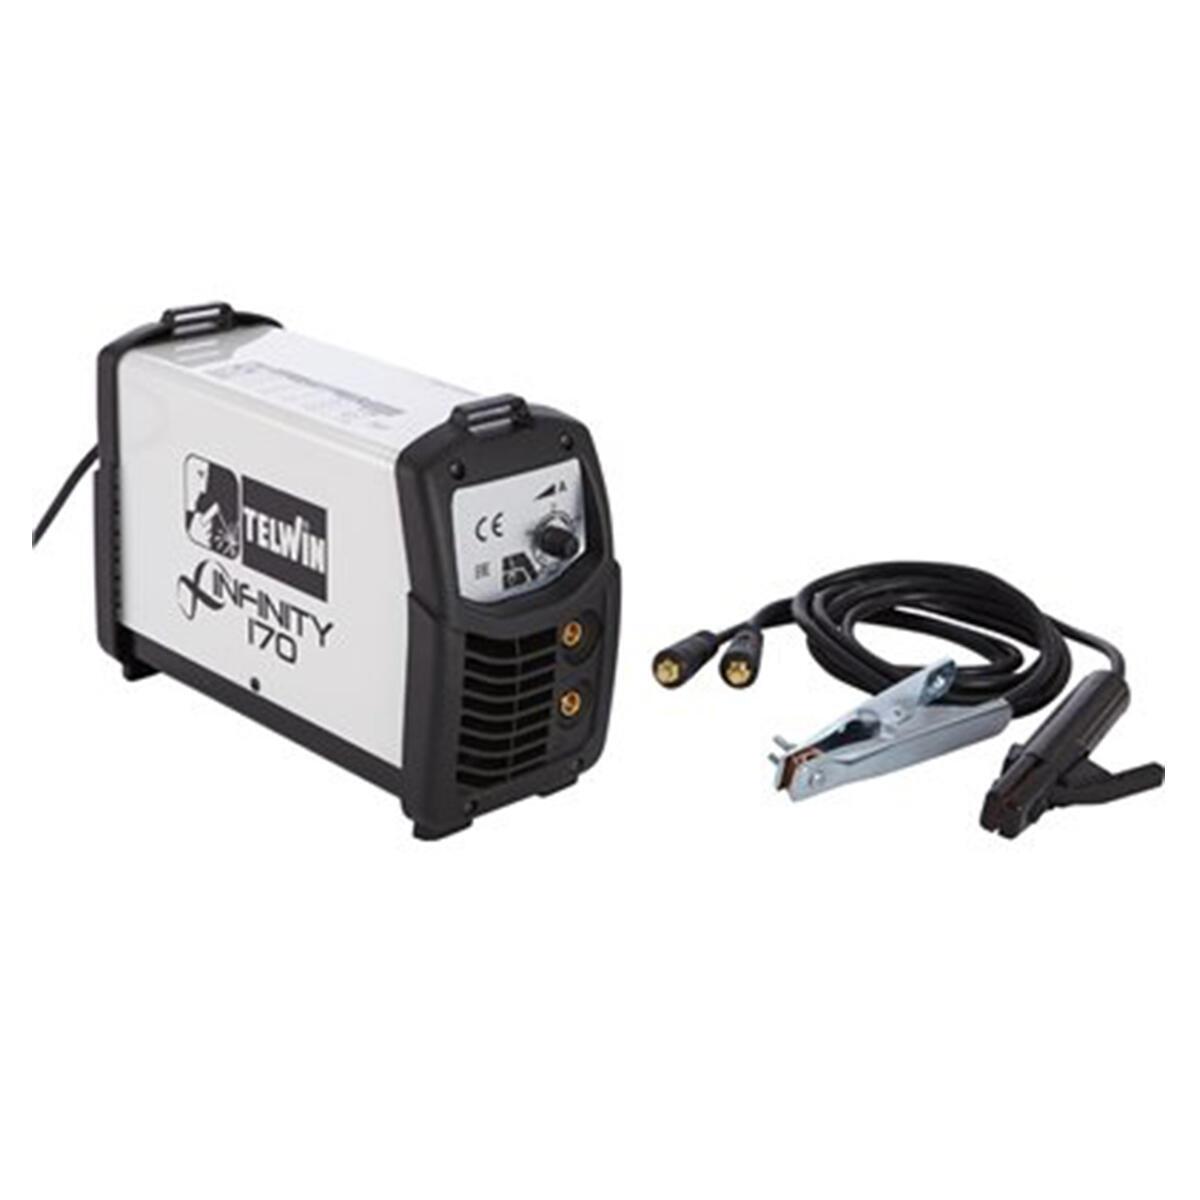 Saldatrice inverter TELWIN 816080 mma, tig 150 A 4000 W